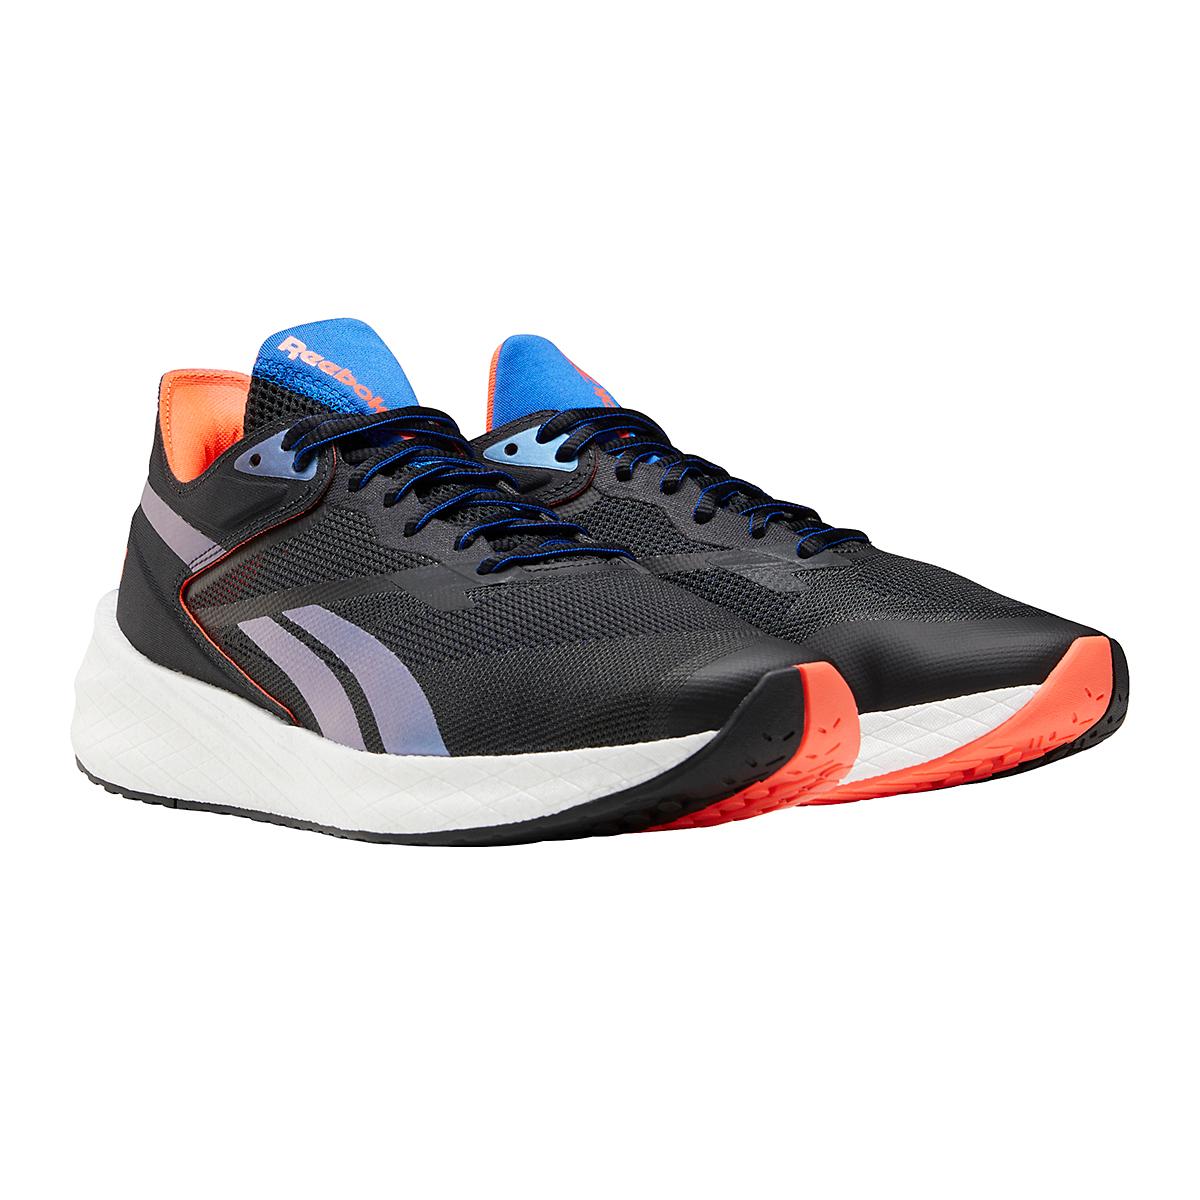 Men's Reebok Floatride Energy Symmetros Running Shoe - Color: Night Black/Court Blue/Orange Flare - Size: 7 - Width: Regular, Night Black/Court Blue/Orange Flare, large, image 4